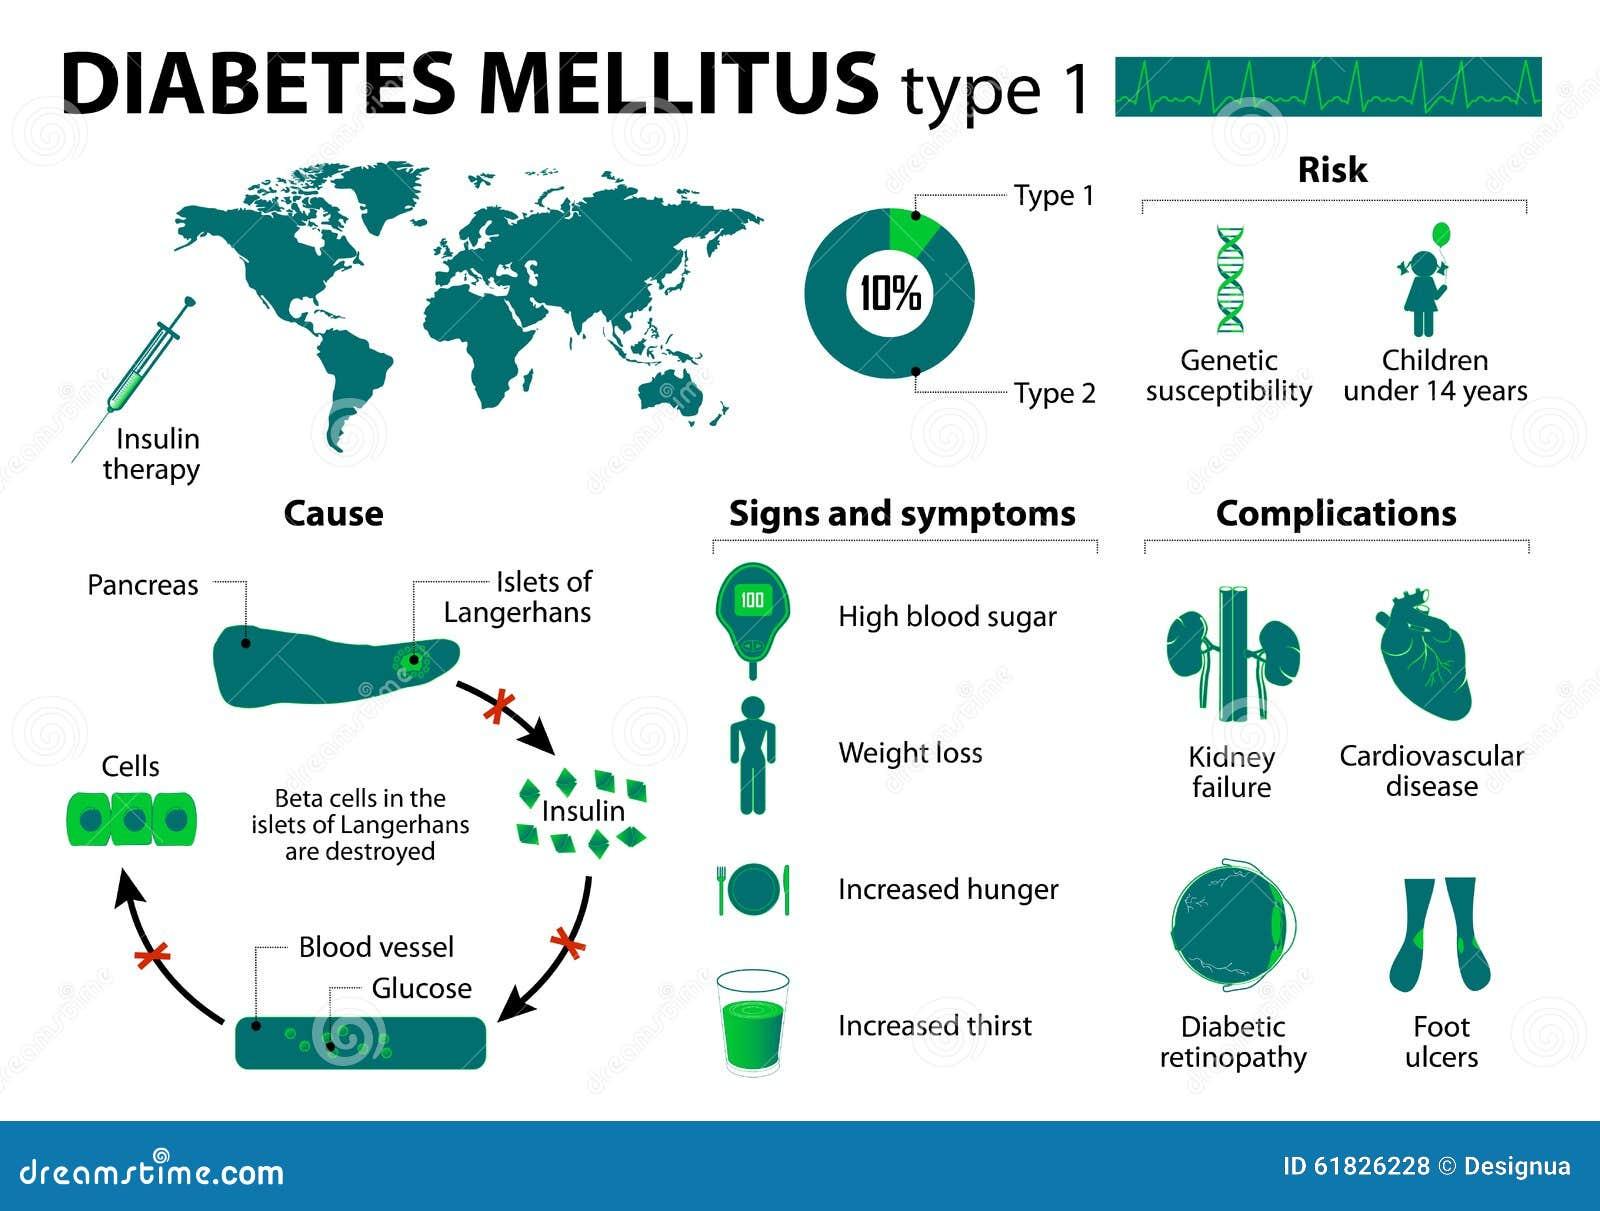 imagenes de diabetes mellitus tipo 1